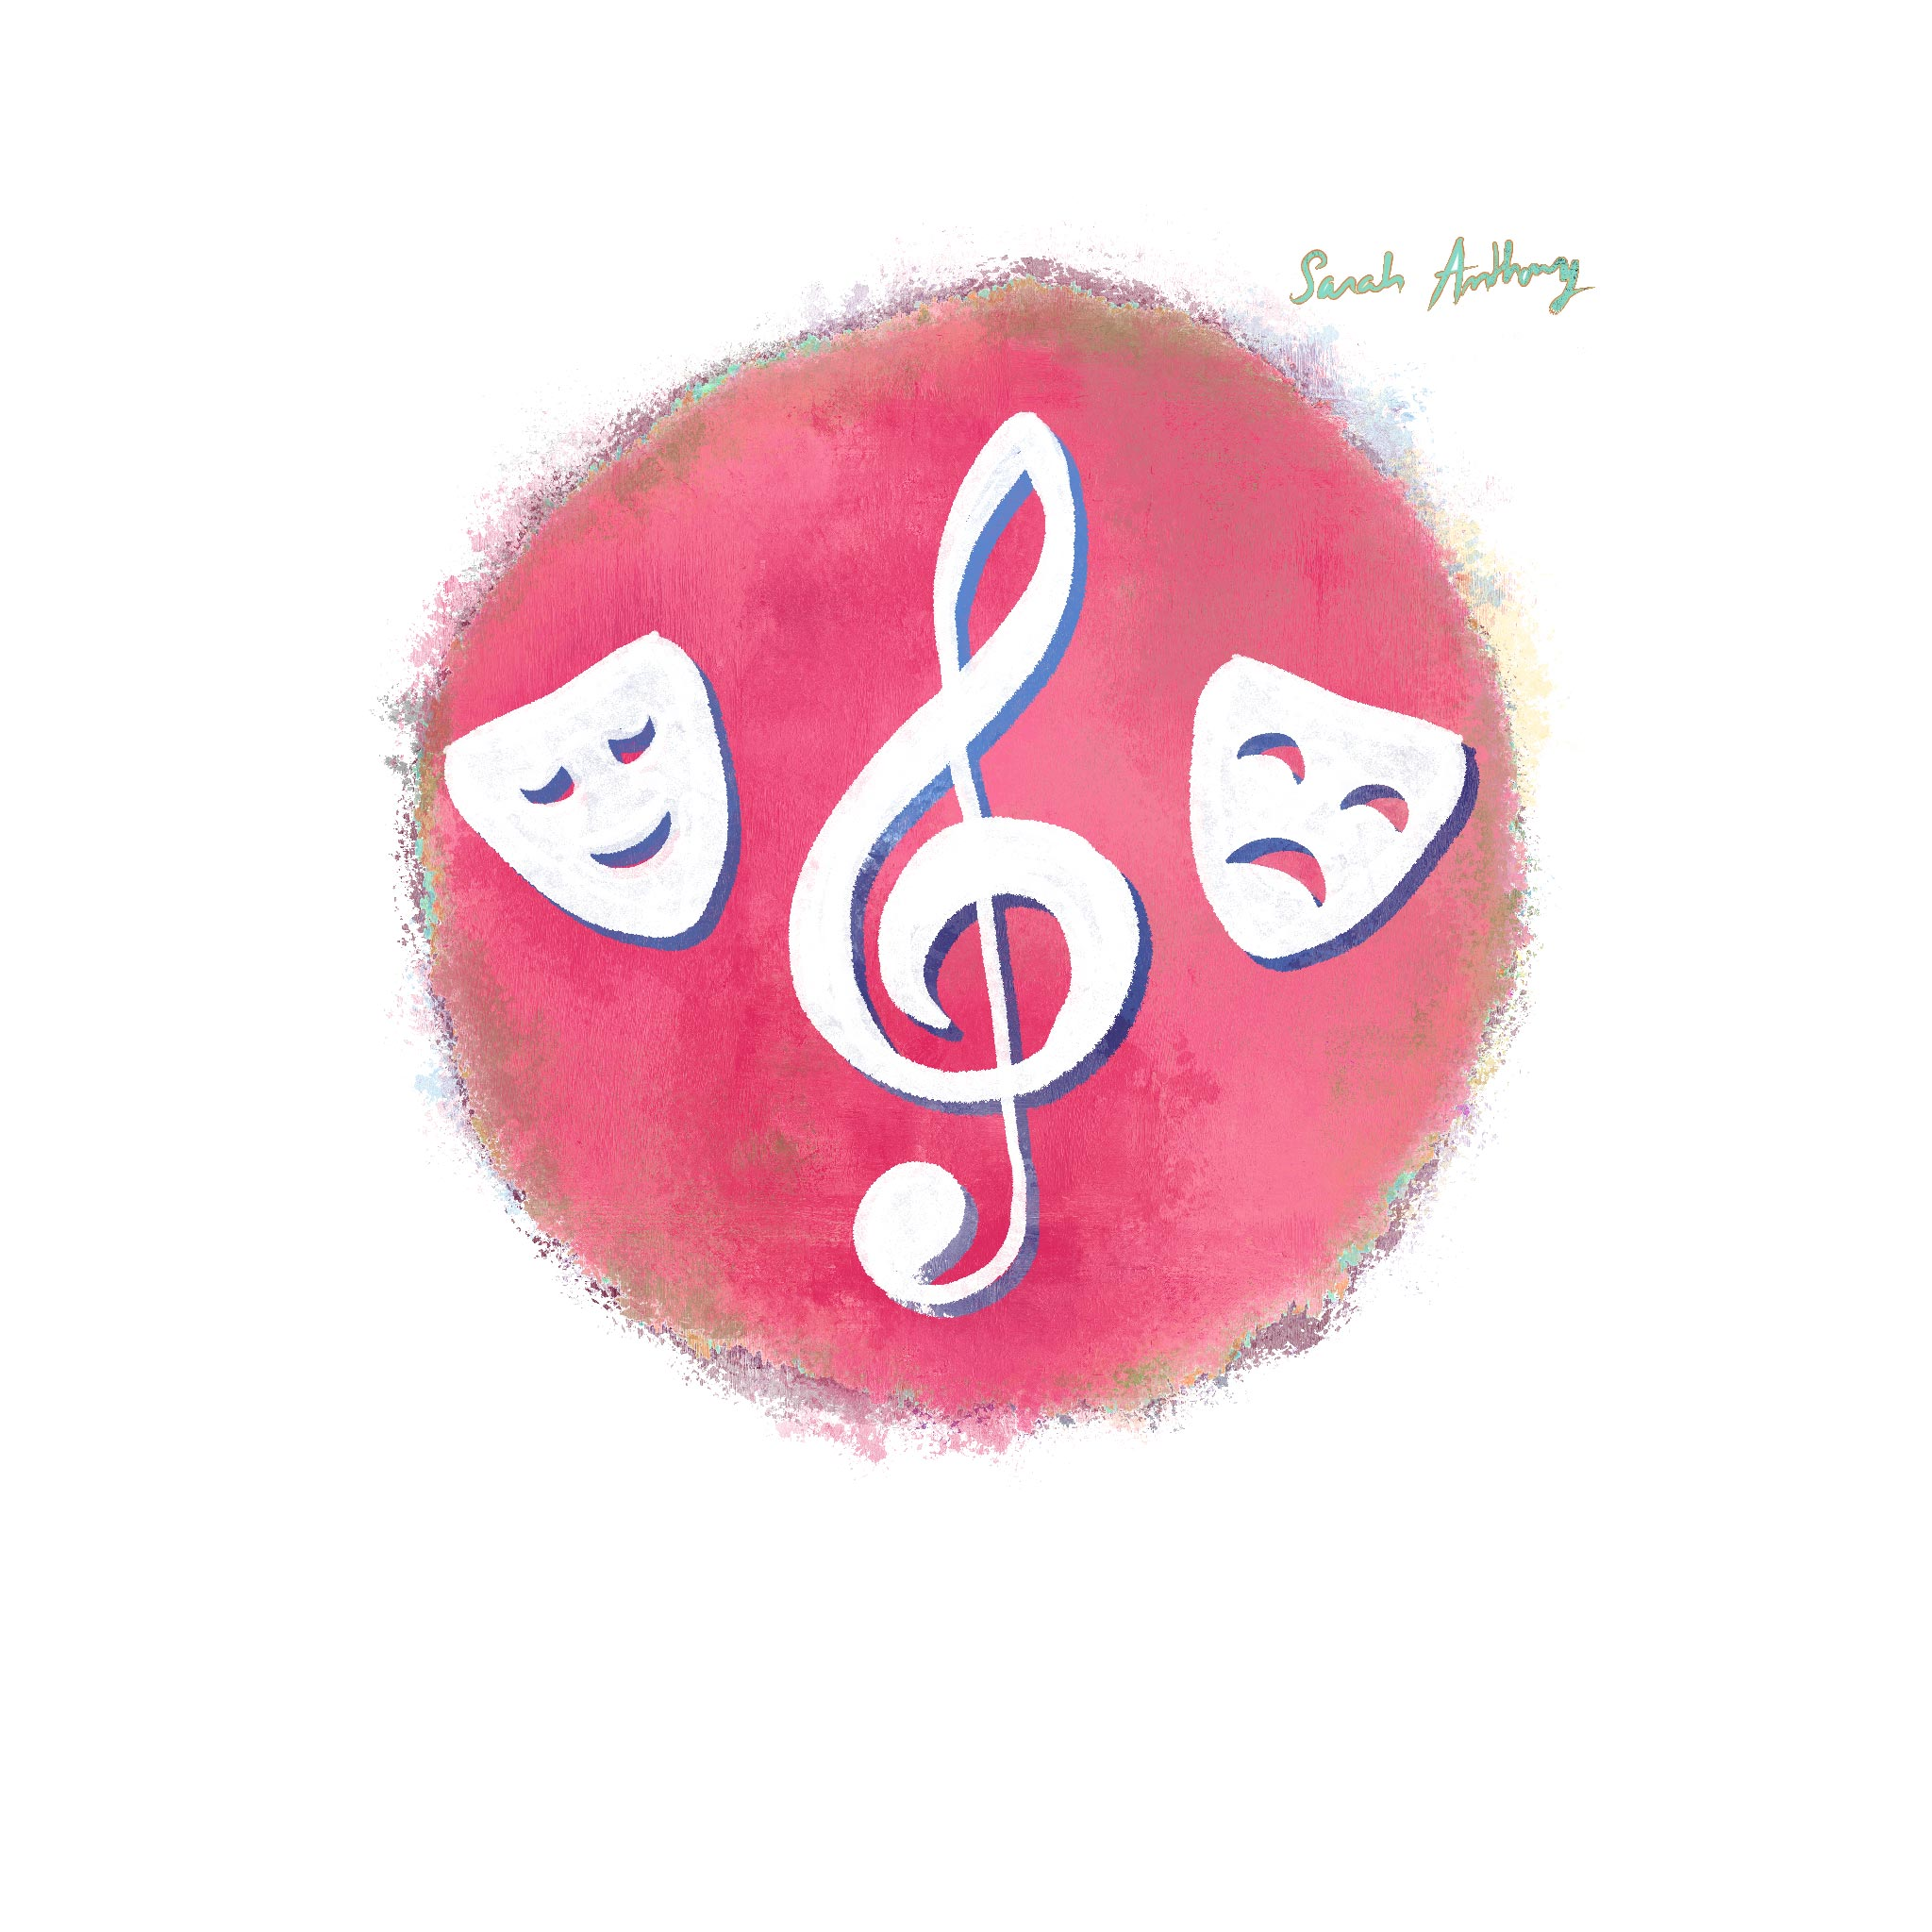 singspiel-sarah-anthony-reduit